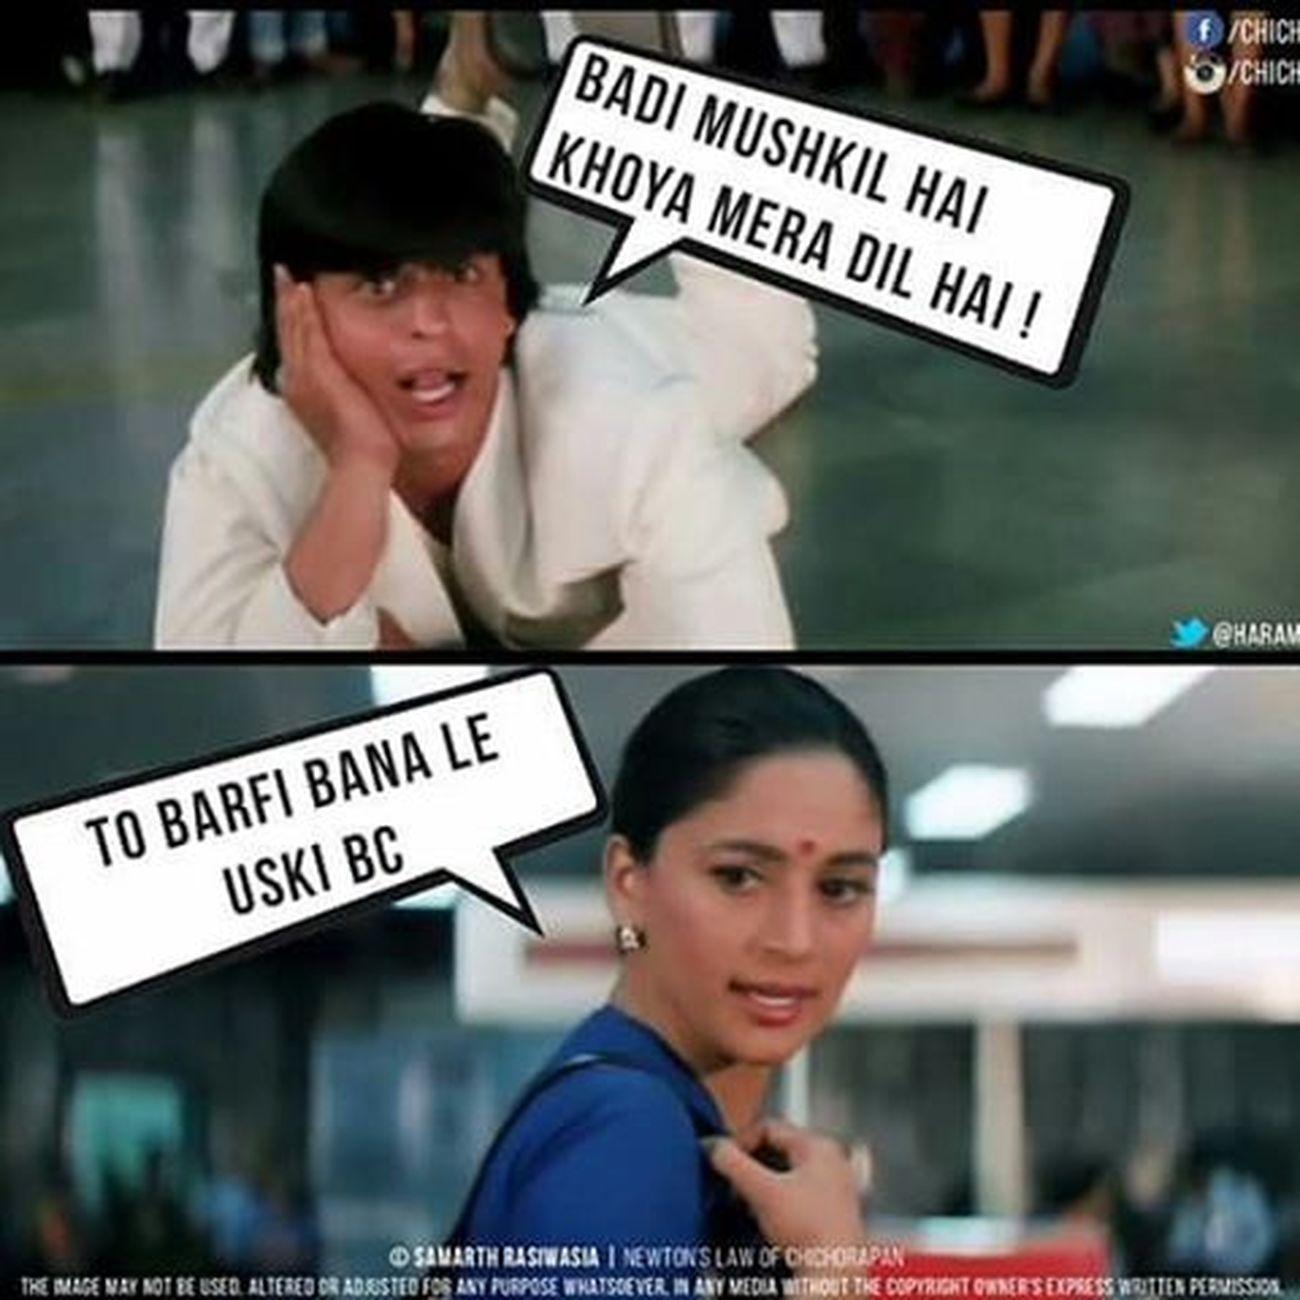 Bwahahaha! 😂 😂 Srk Madhuridixit Bollywood Bollywoodtrolls